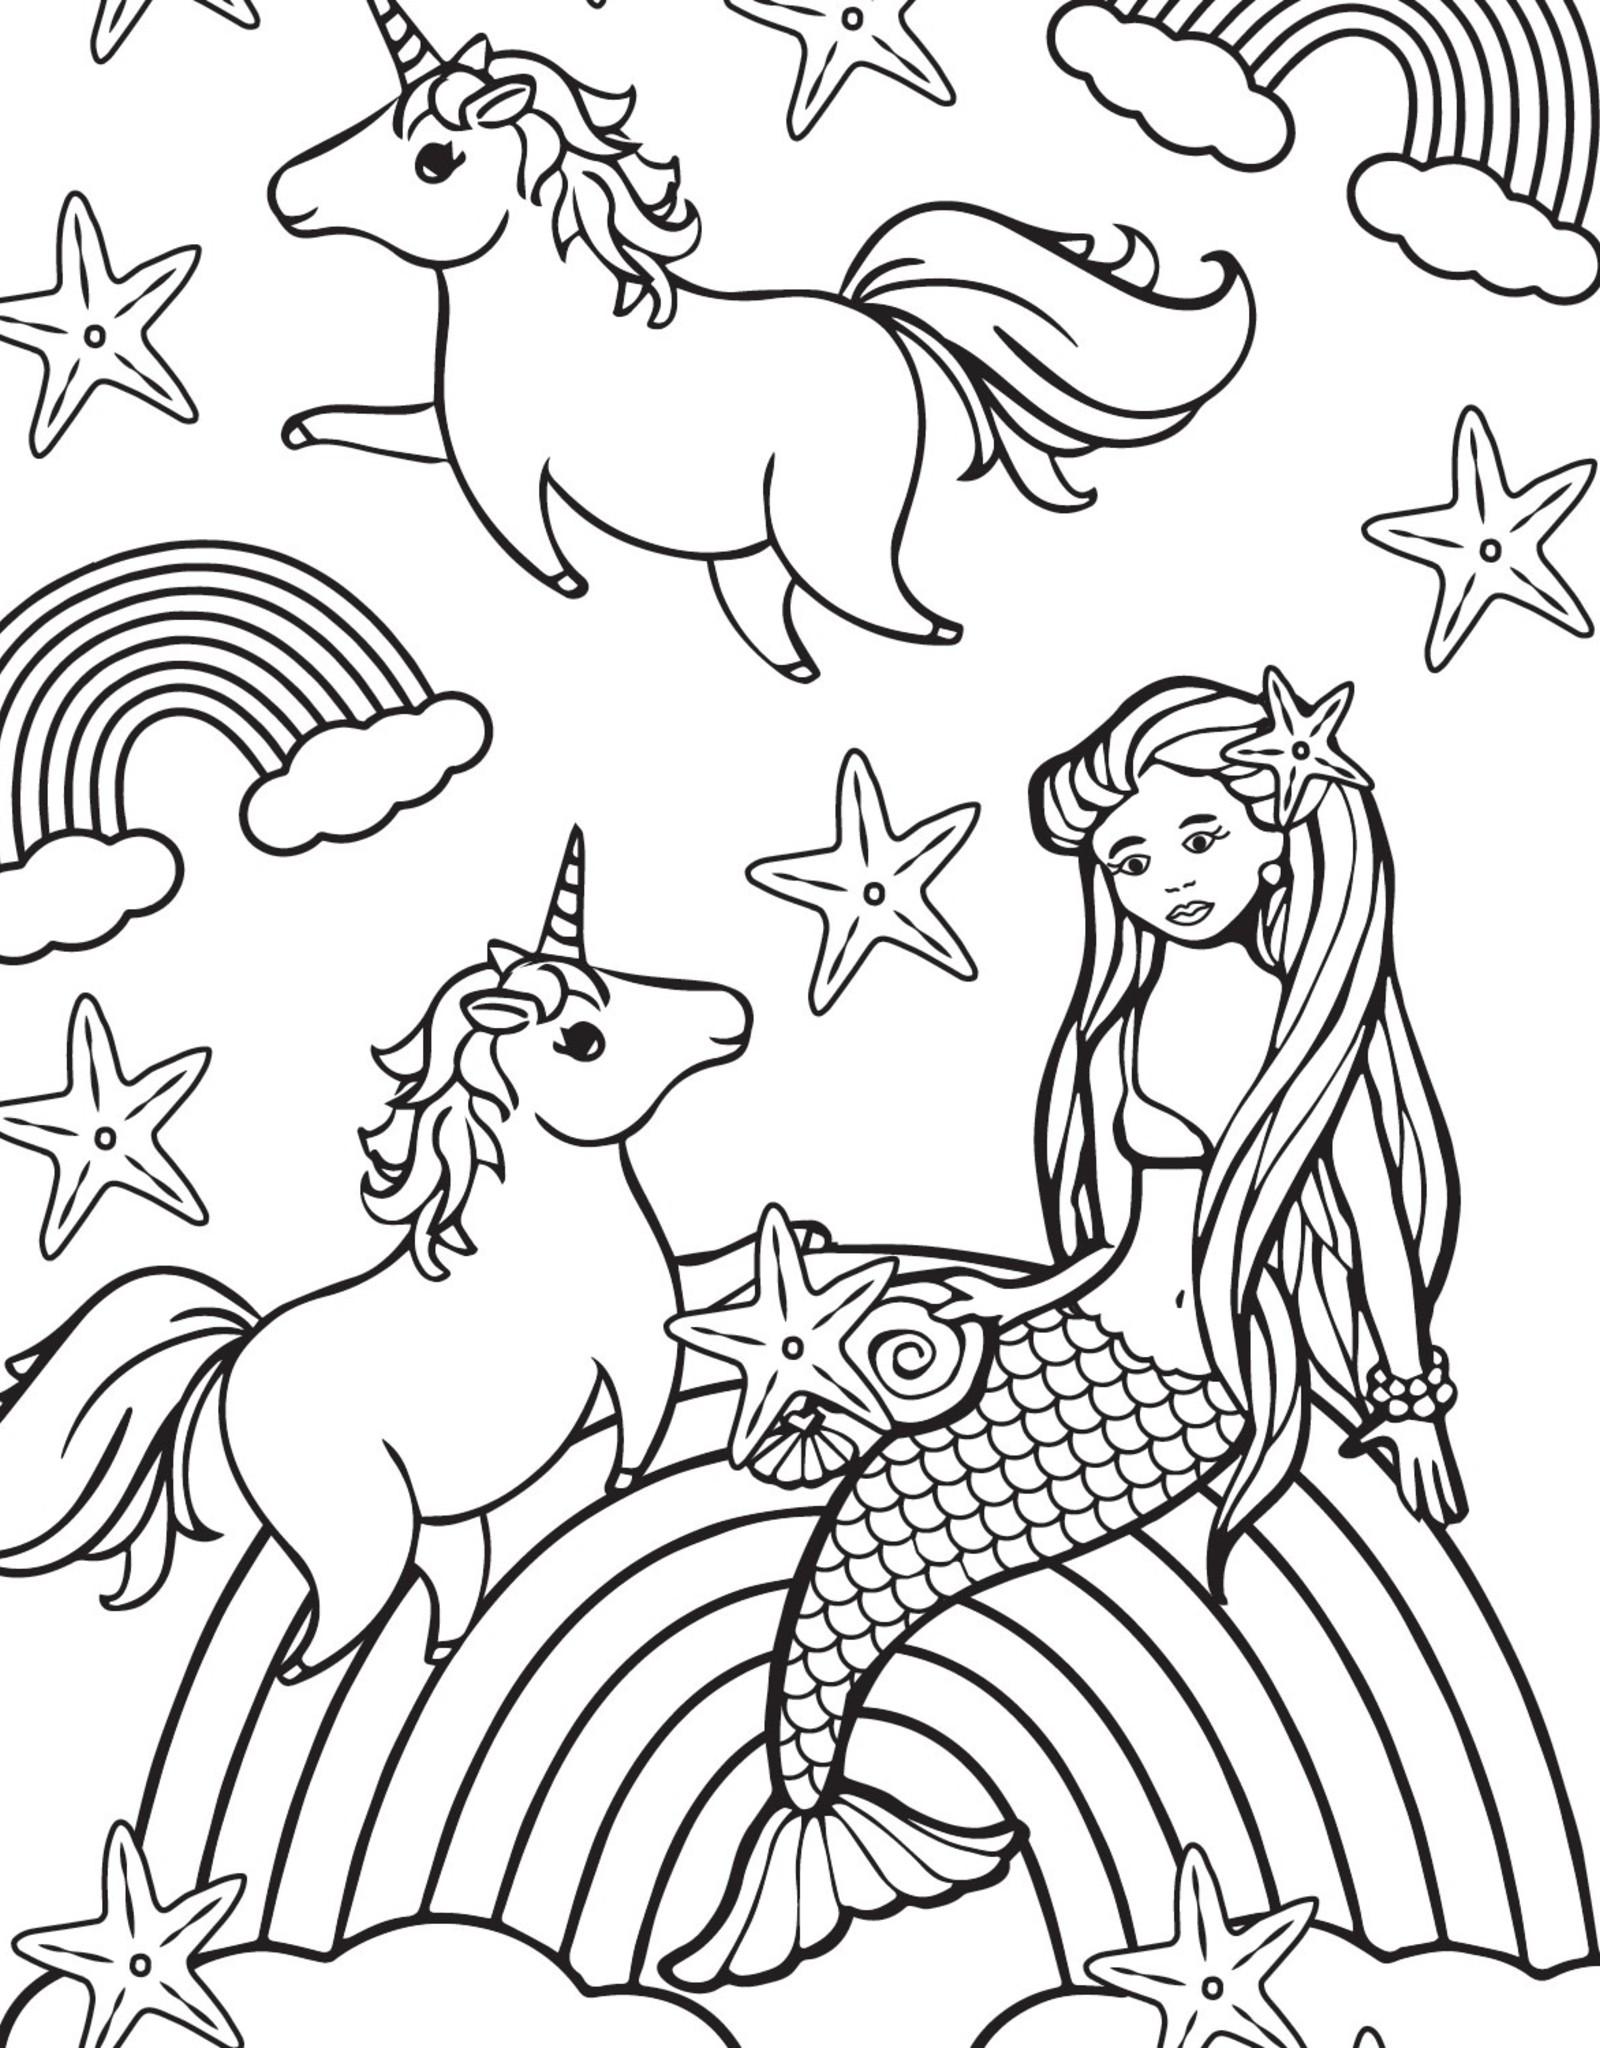 Kandi Designz Unicorns and Mermaids Mini Coloring Book